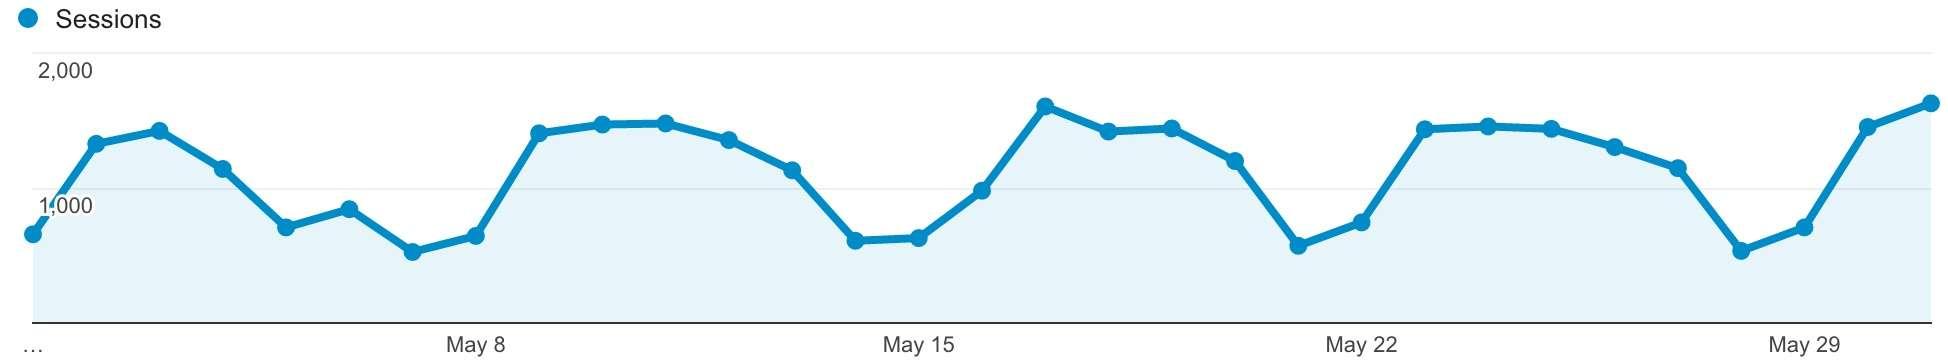 50k visiteurs mensuels